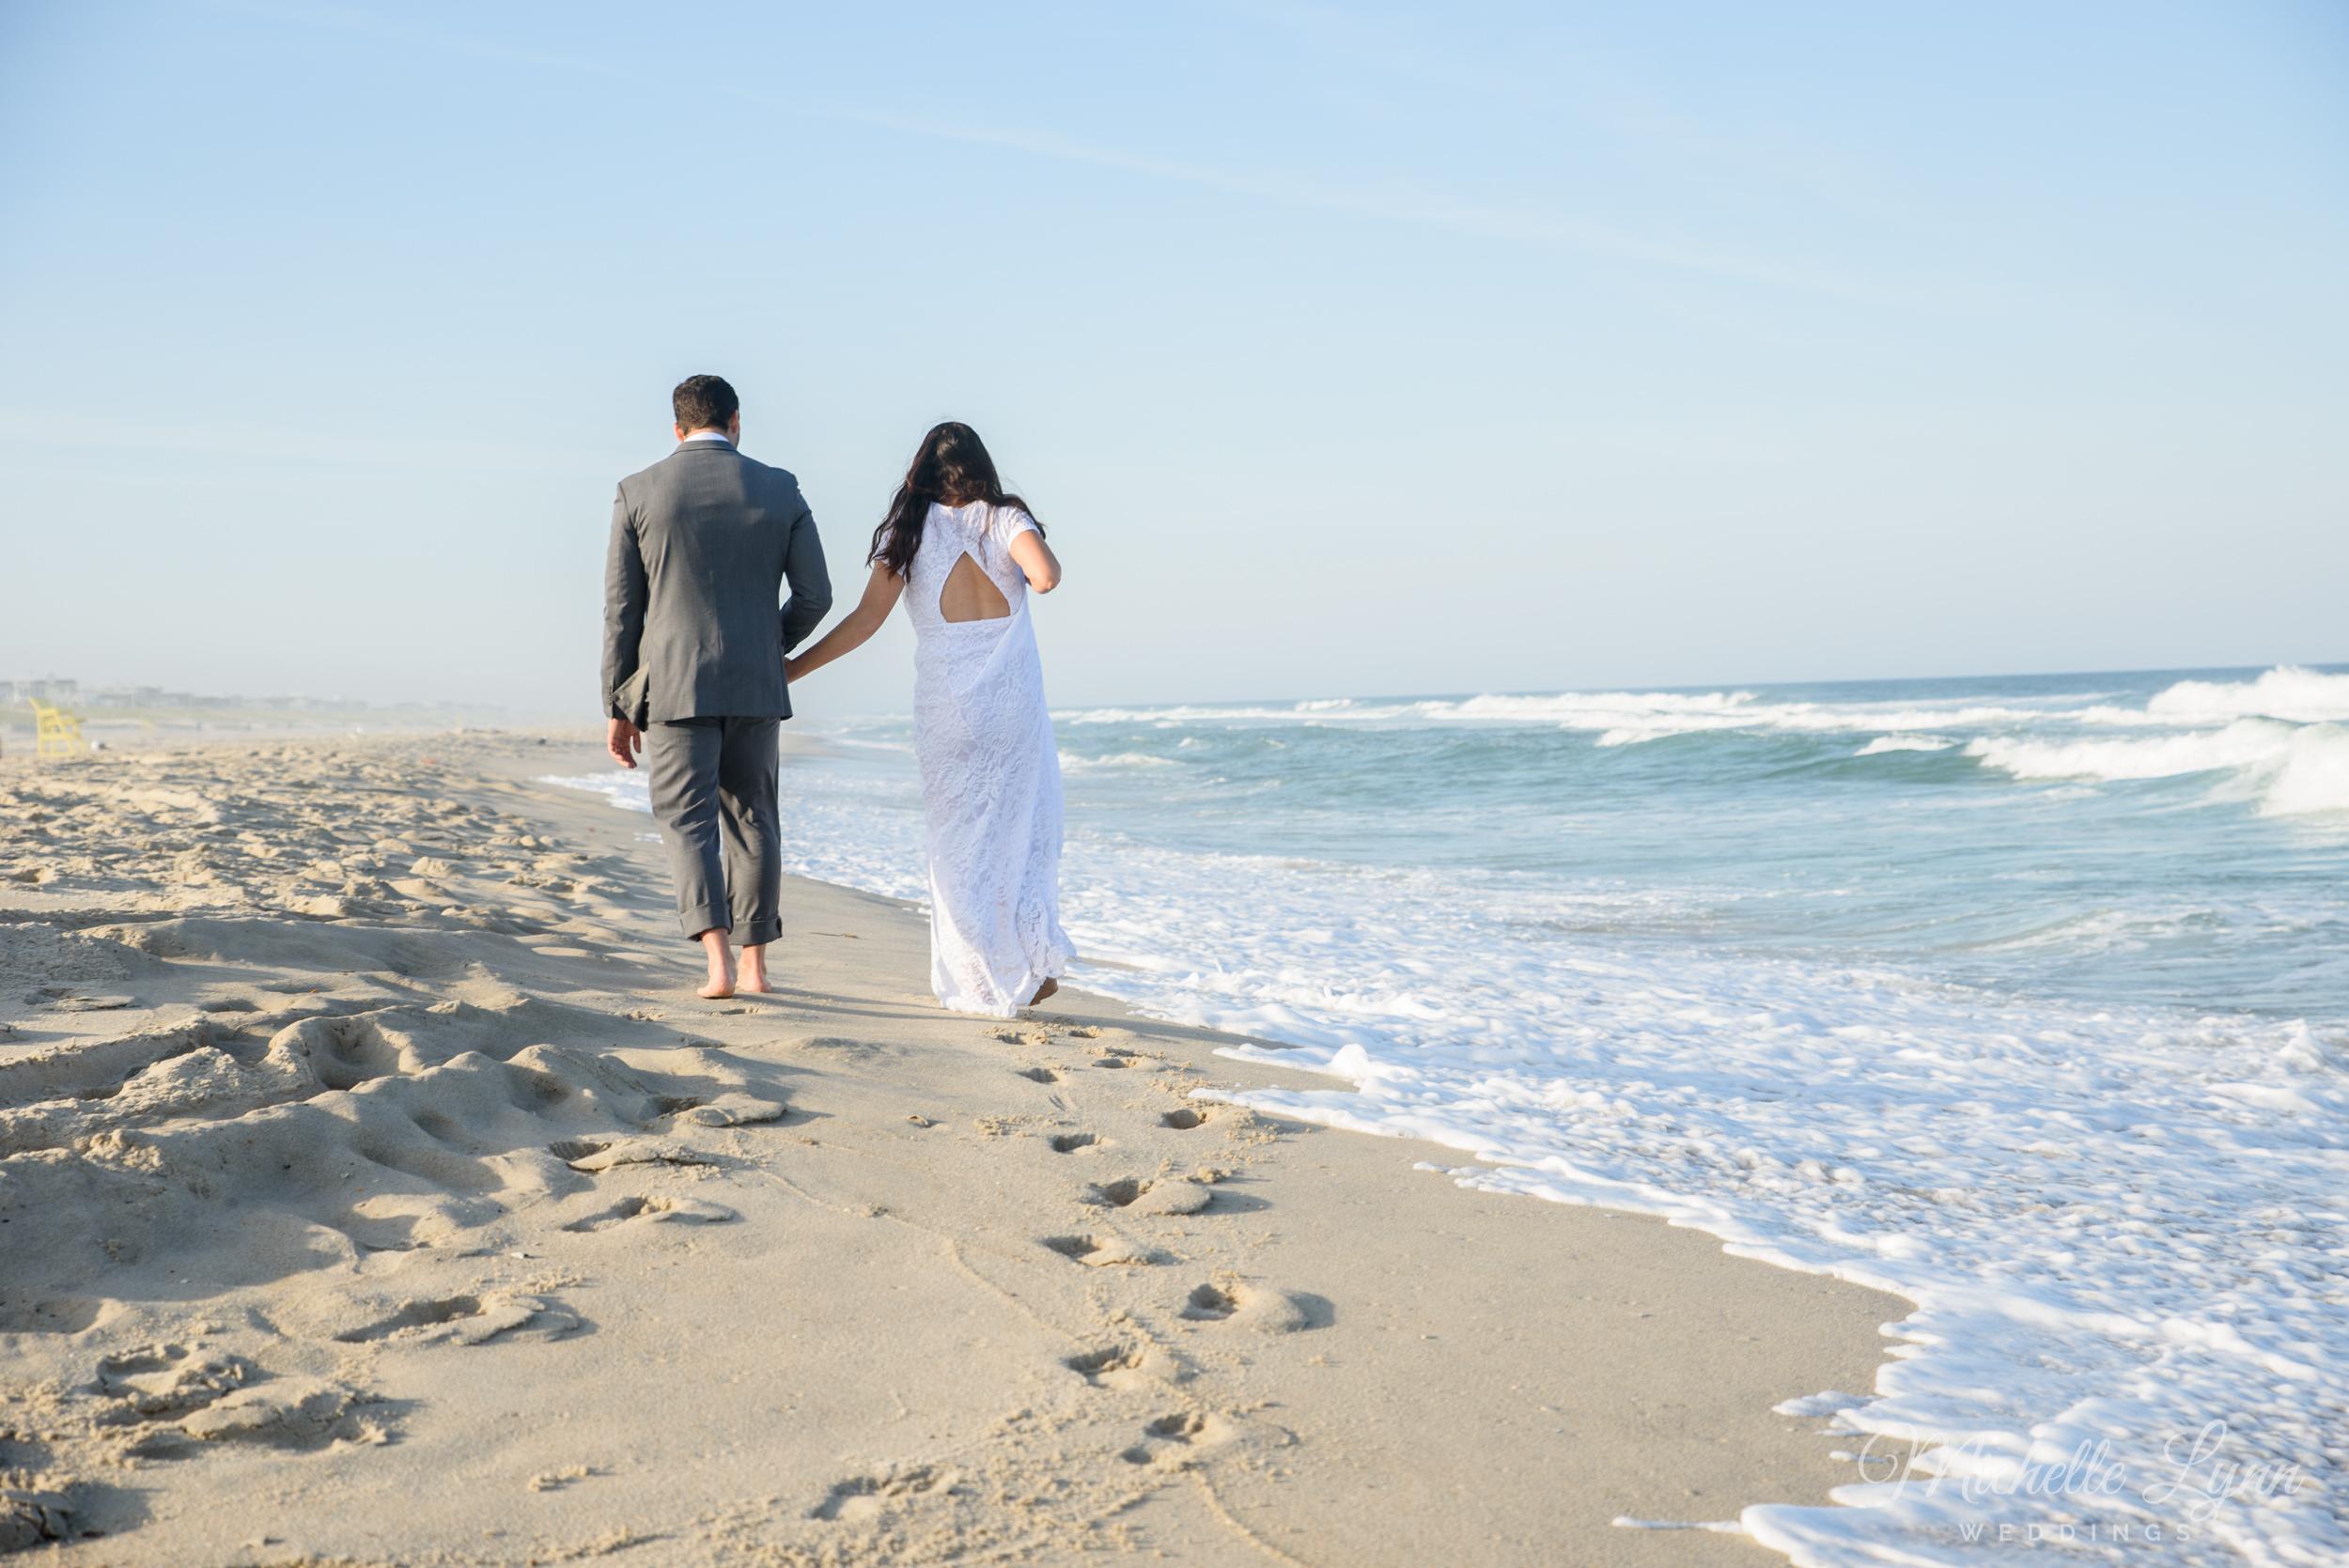 mlw-long-beach-island-new-jersey-wedding-photography-13.jpg